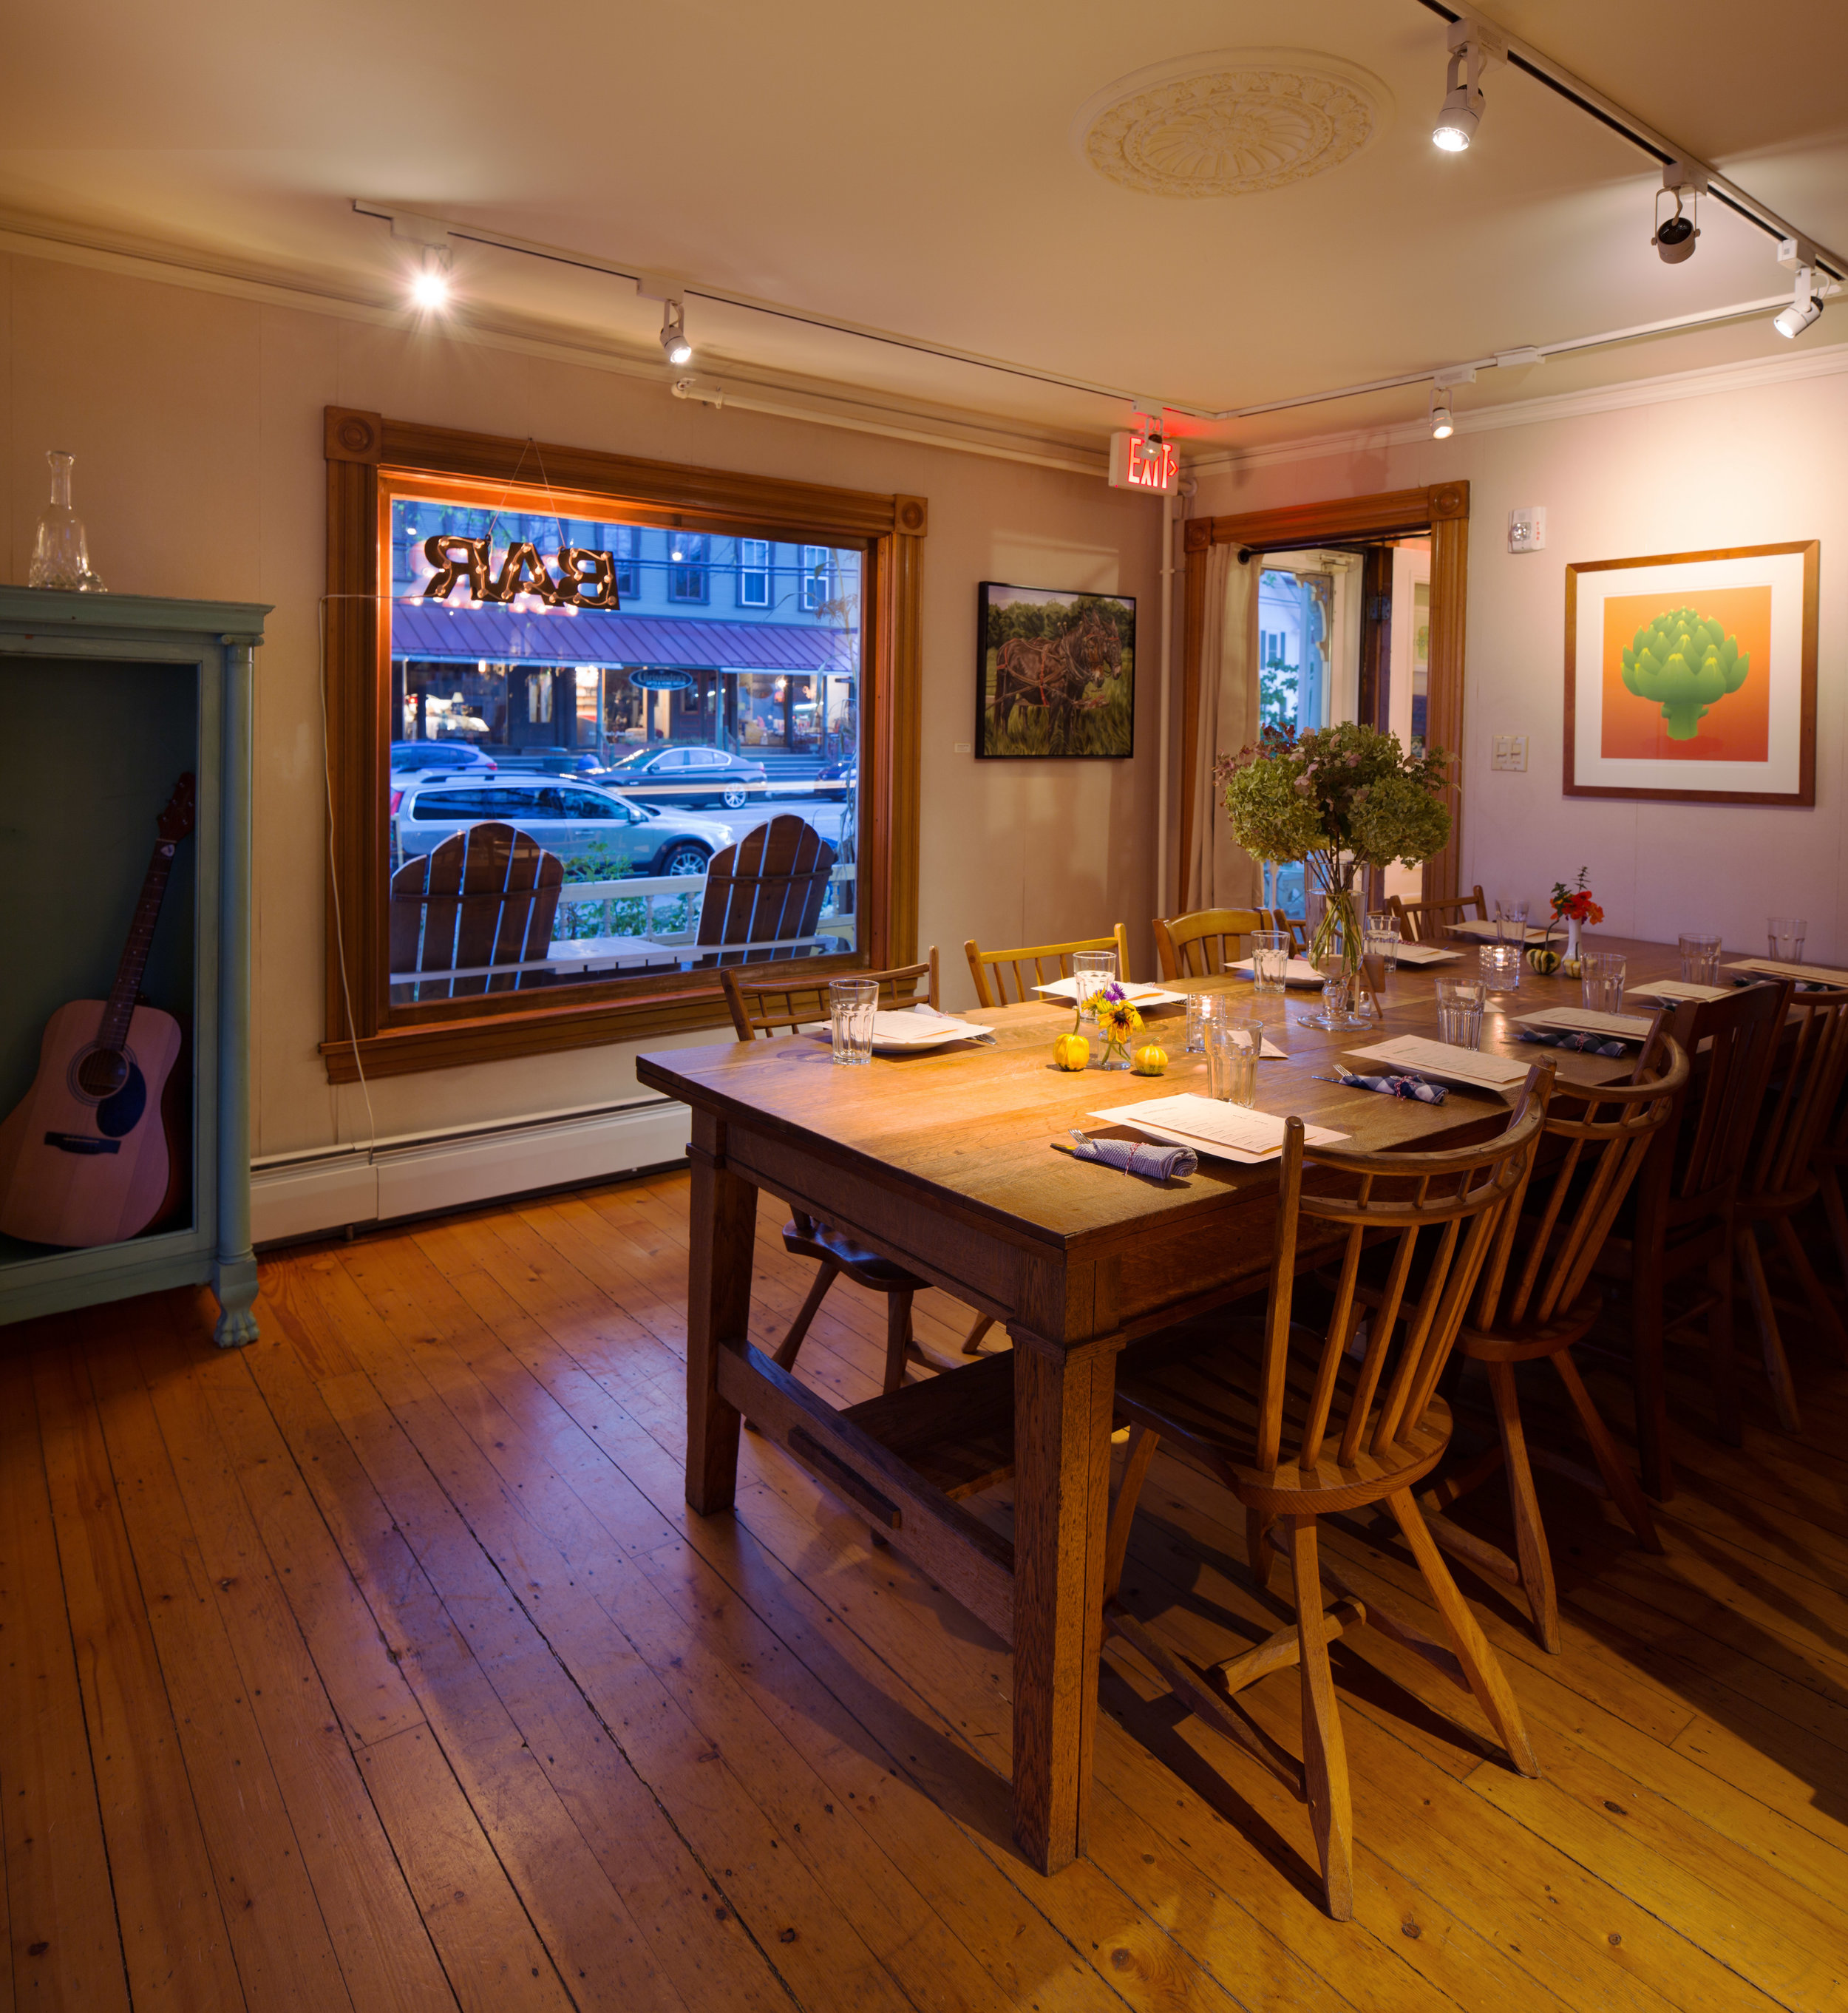 Homestyle Hostel_Family Dining Table 1.jpg